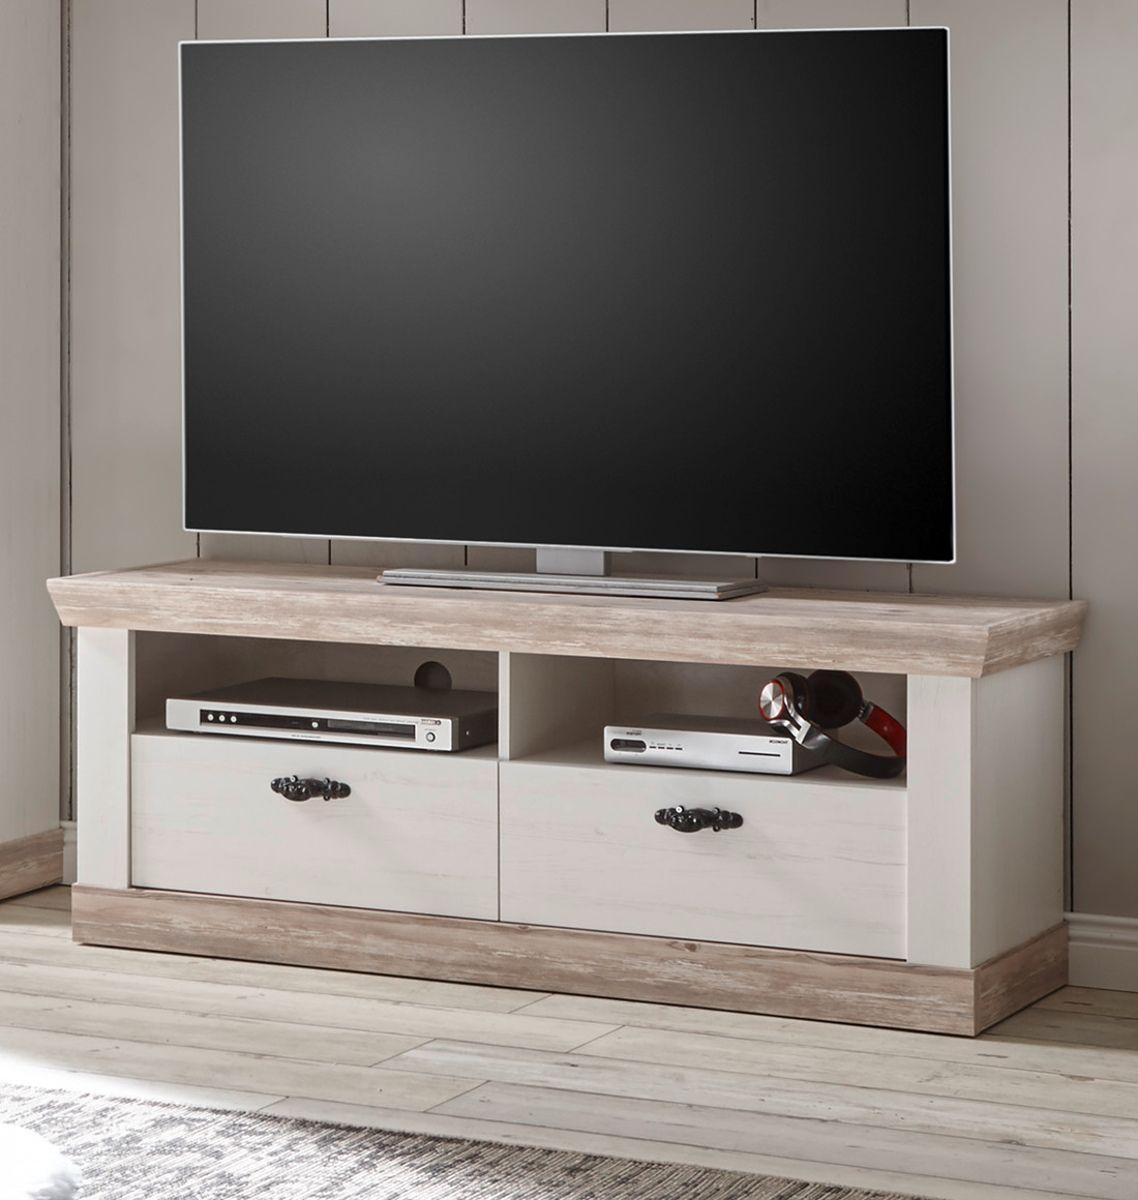 TV-Lowboard Rovola in Pinie weiss Landhaus 134 x 51 cm